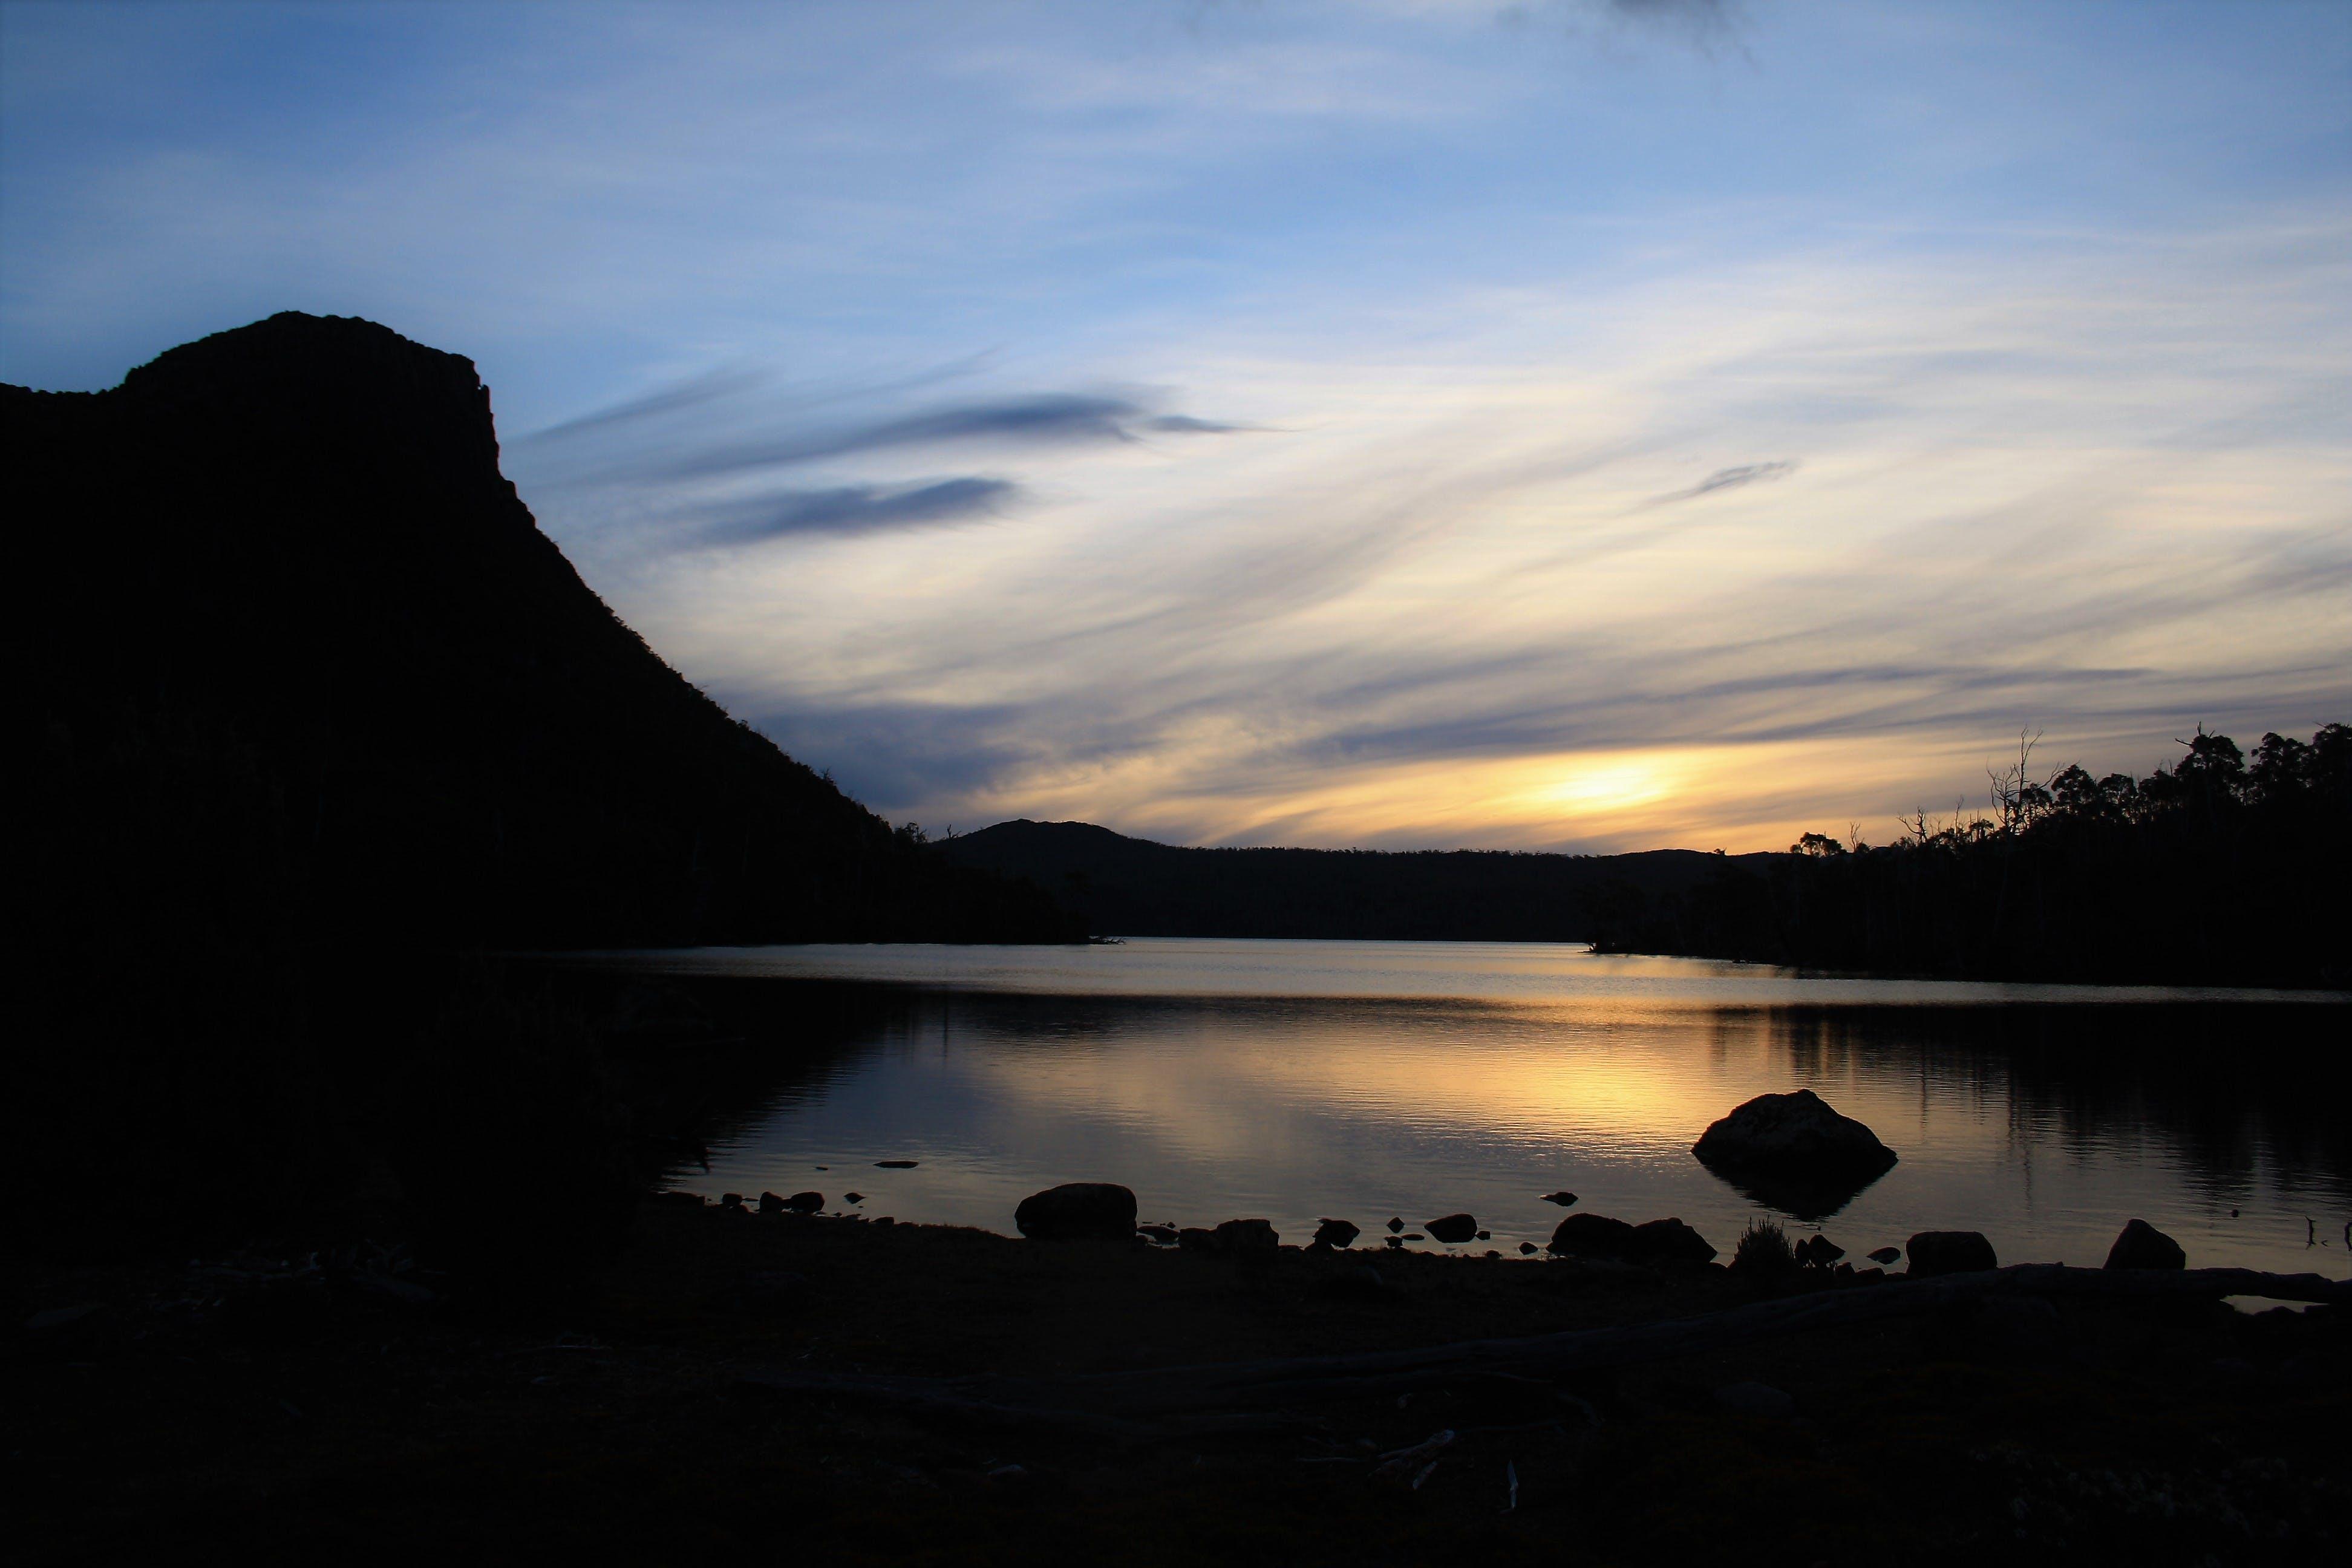 Free stock photo of Lake Mytle and Mt Ragoona